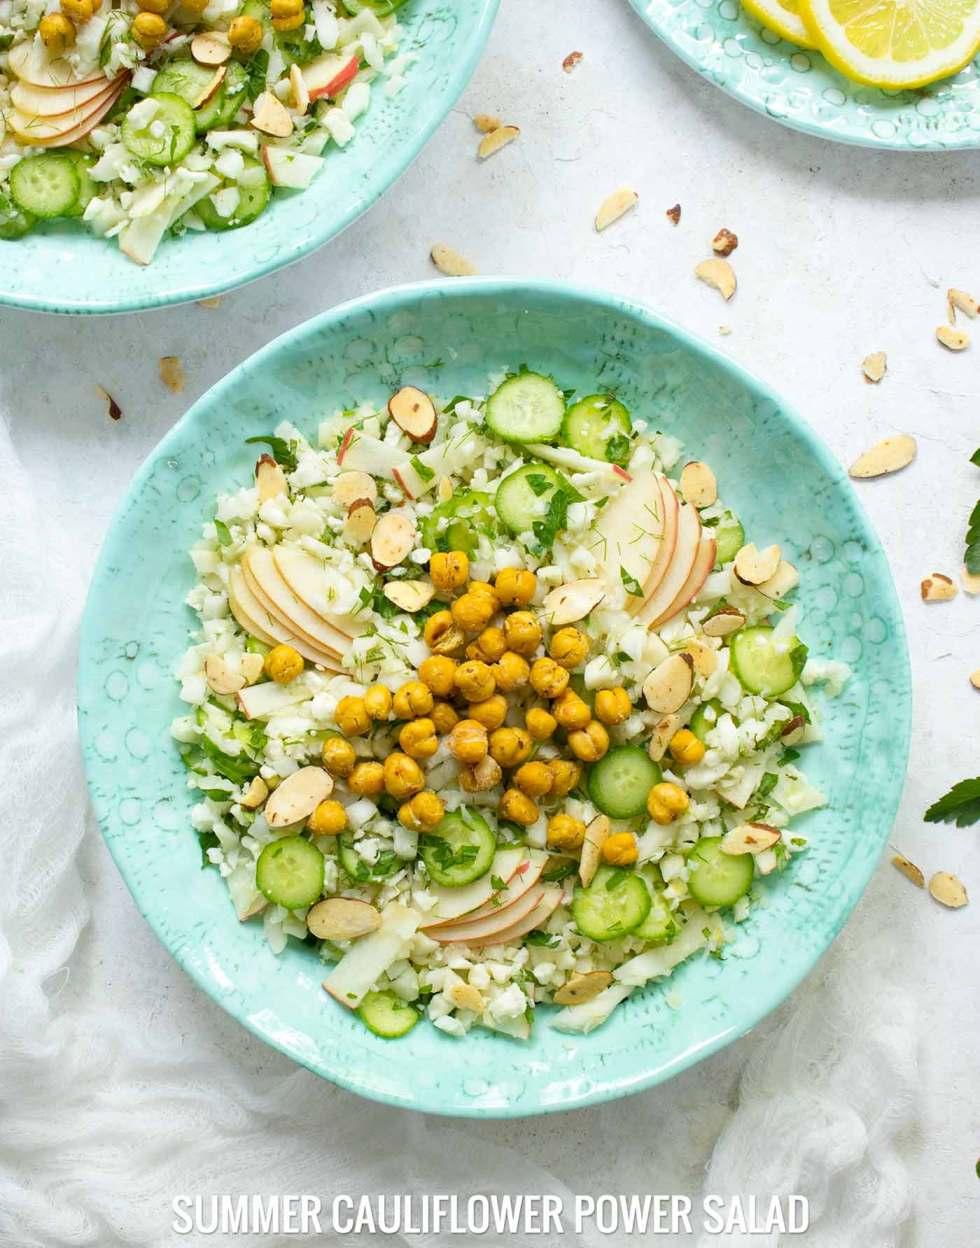 Summer Cauliflower Power Salad - Recipe at SoupAddict.com